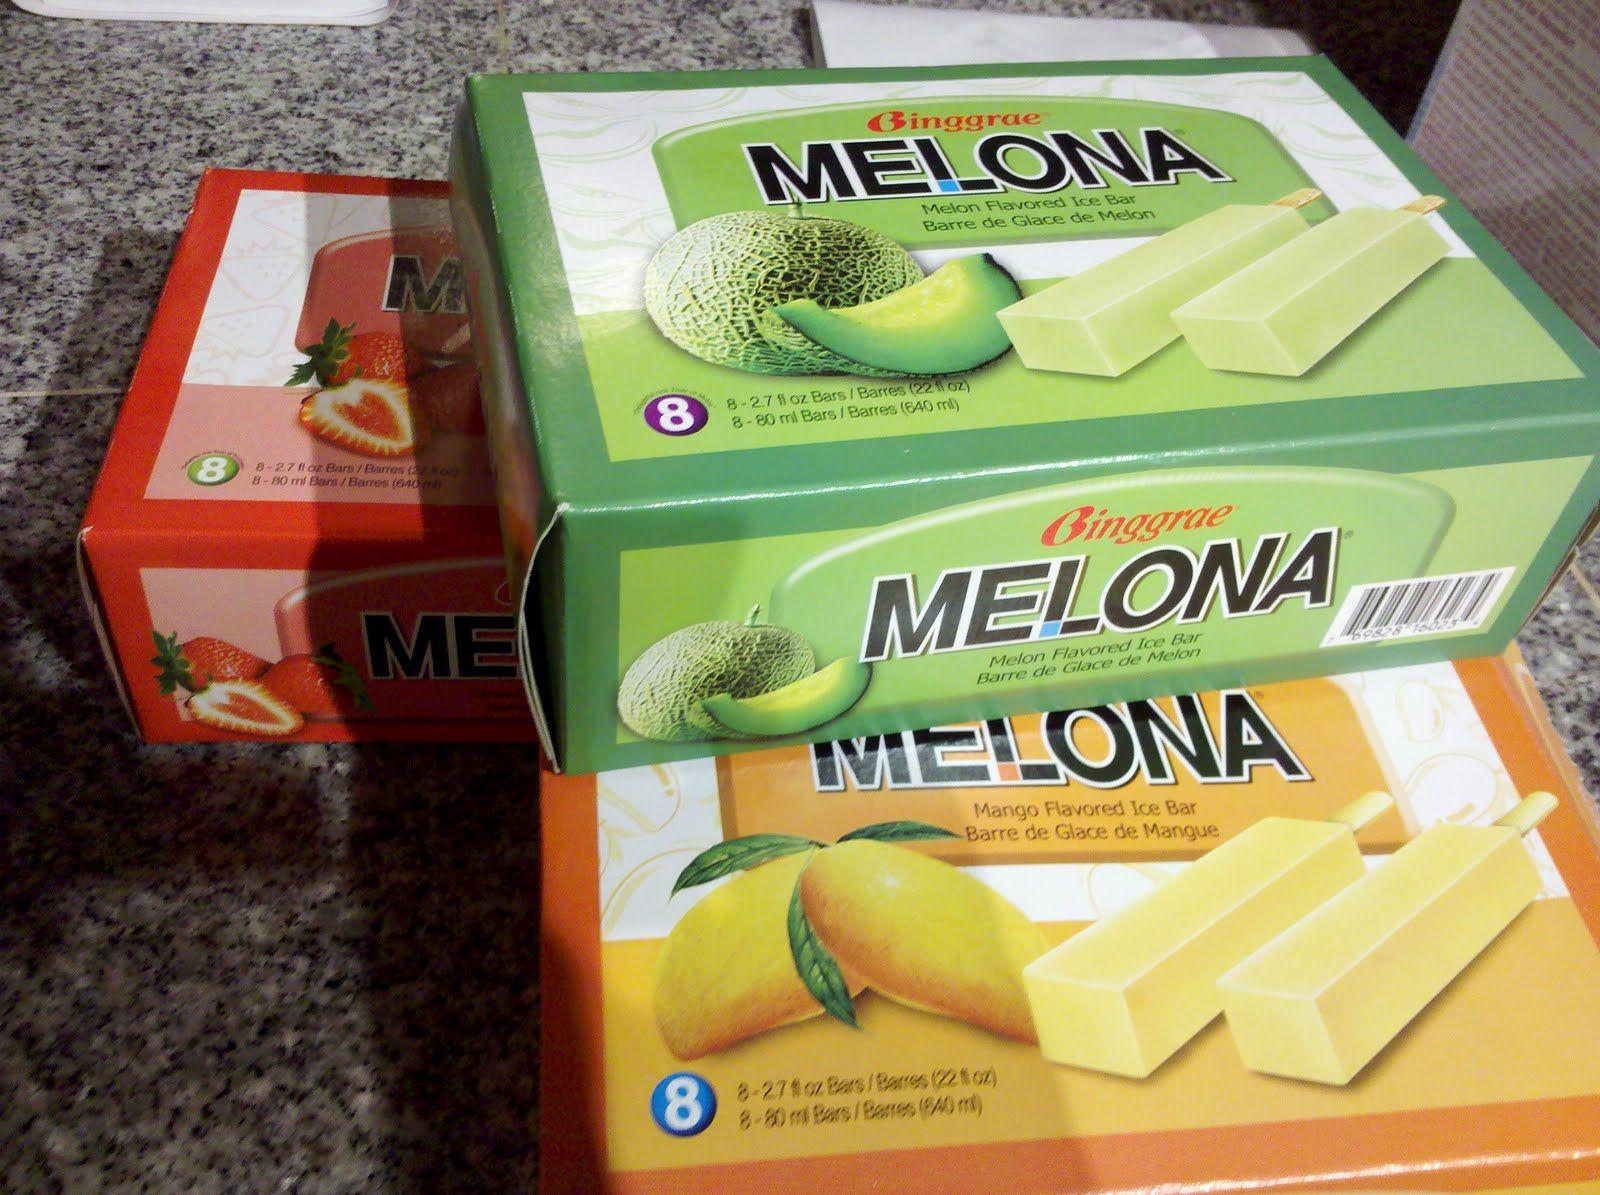 Are You Eating That Melona Ice Bars Melona Ice Bars Korean Ice Cream